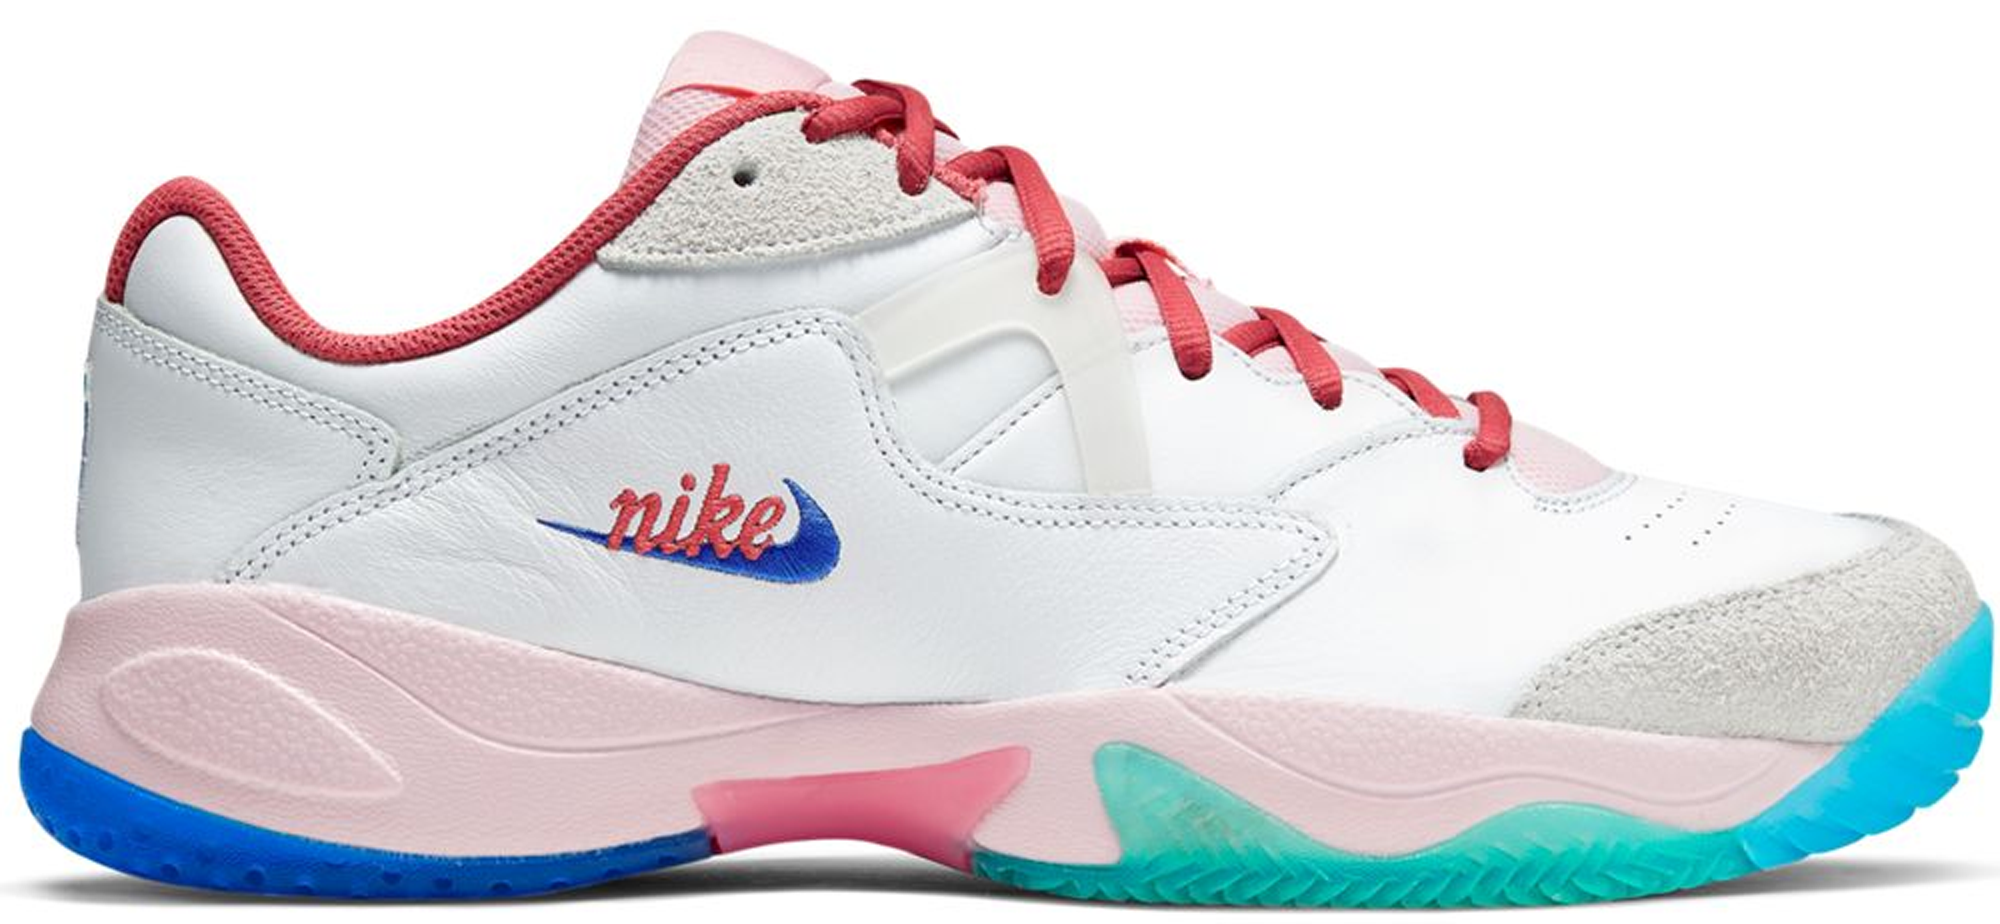 Nike Court Lite 2 Pink Foam - CJ6781-101